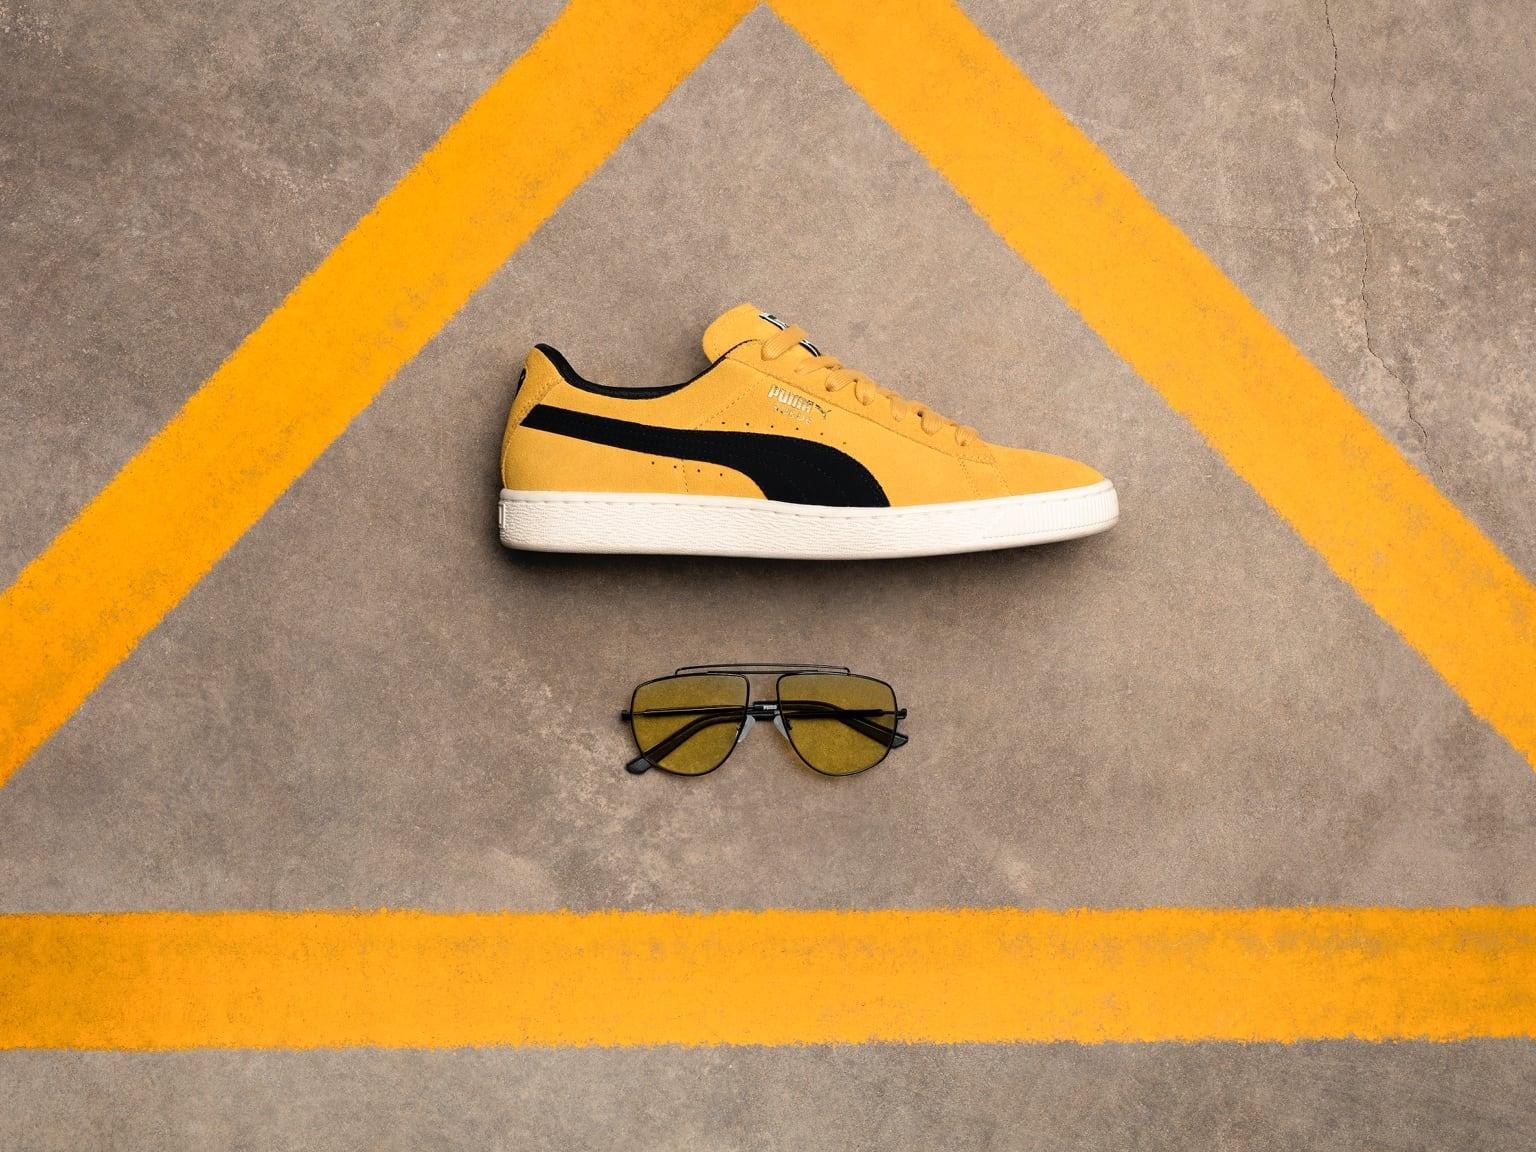 Chaussures Kering Eyewear et PUMA Suede